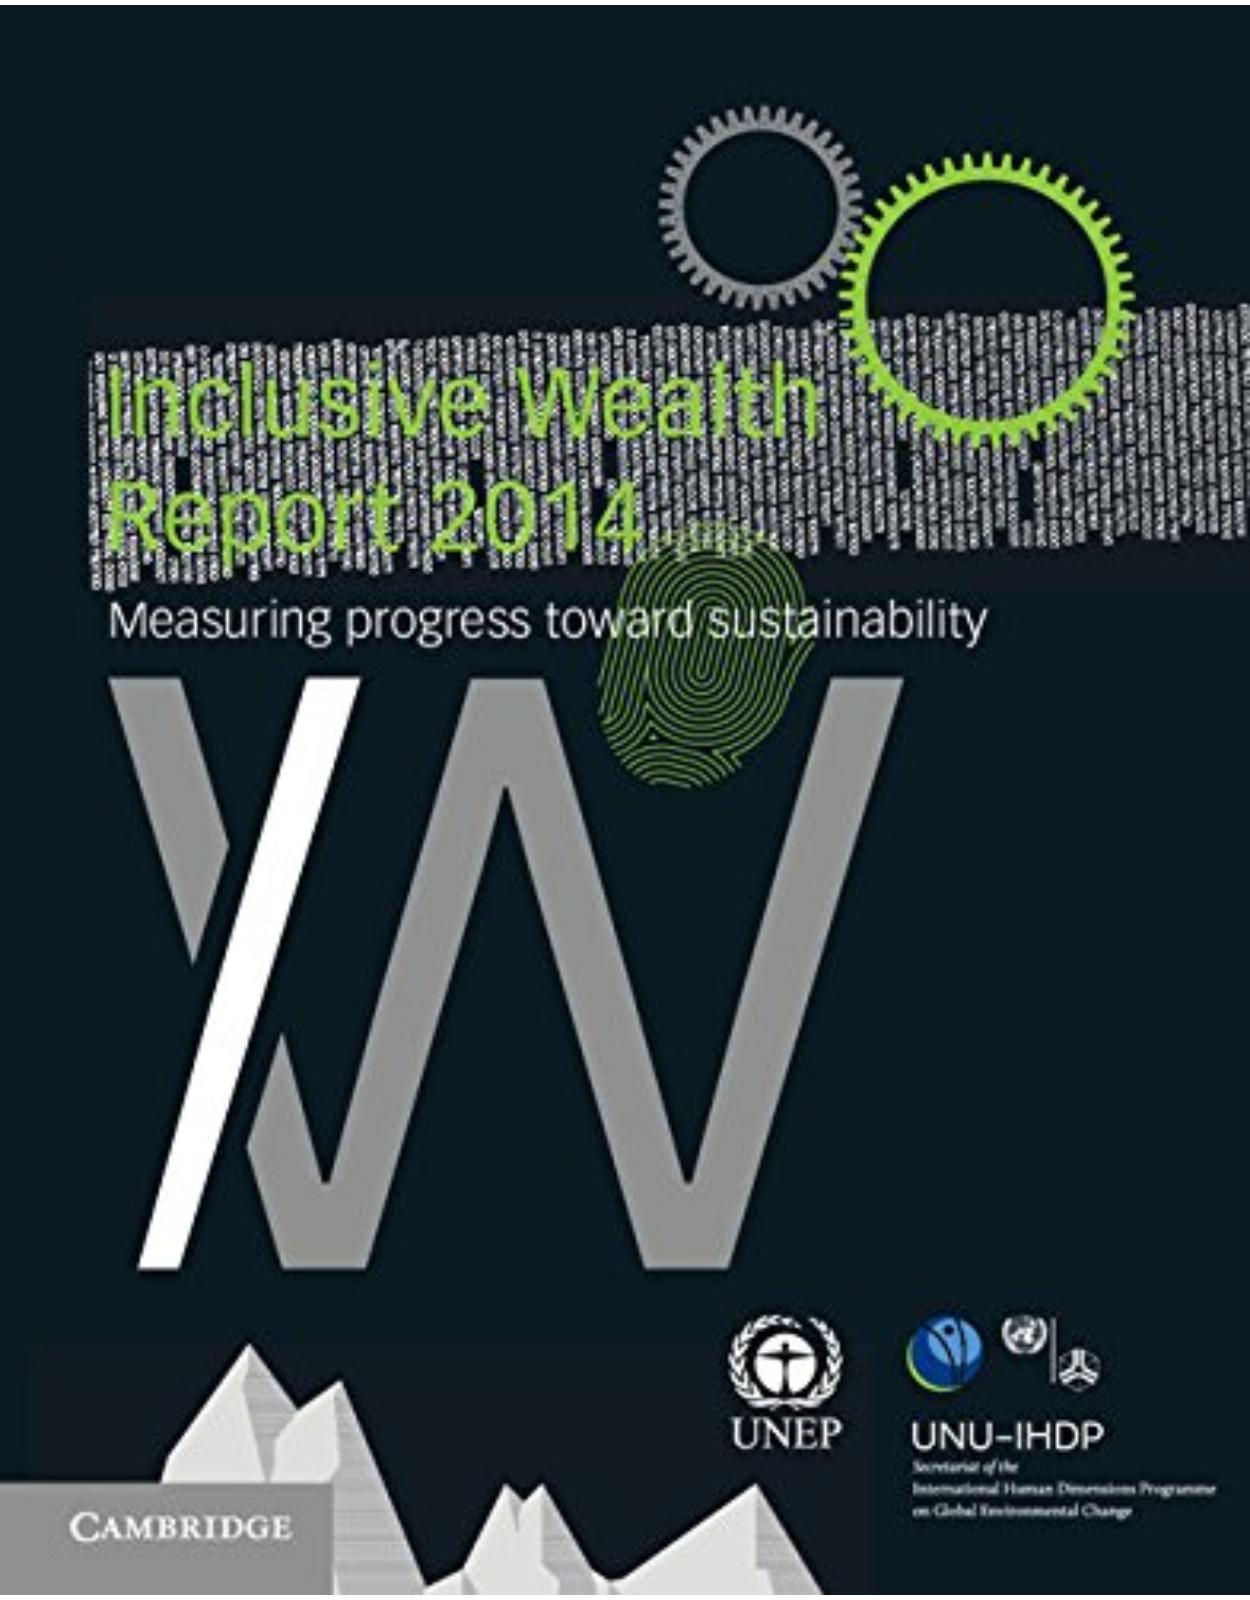 Inclusive Wealth Report 2014: Measuring Progress Towards Sustainability